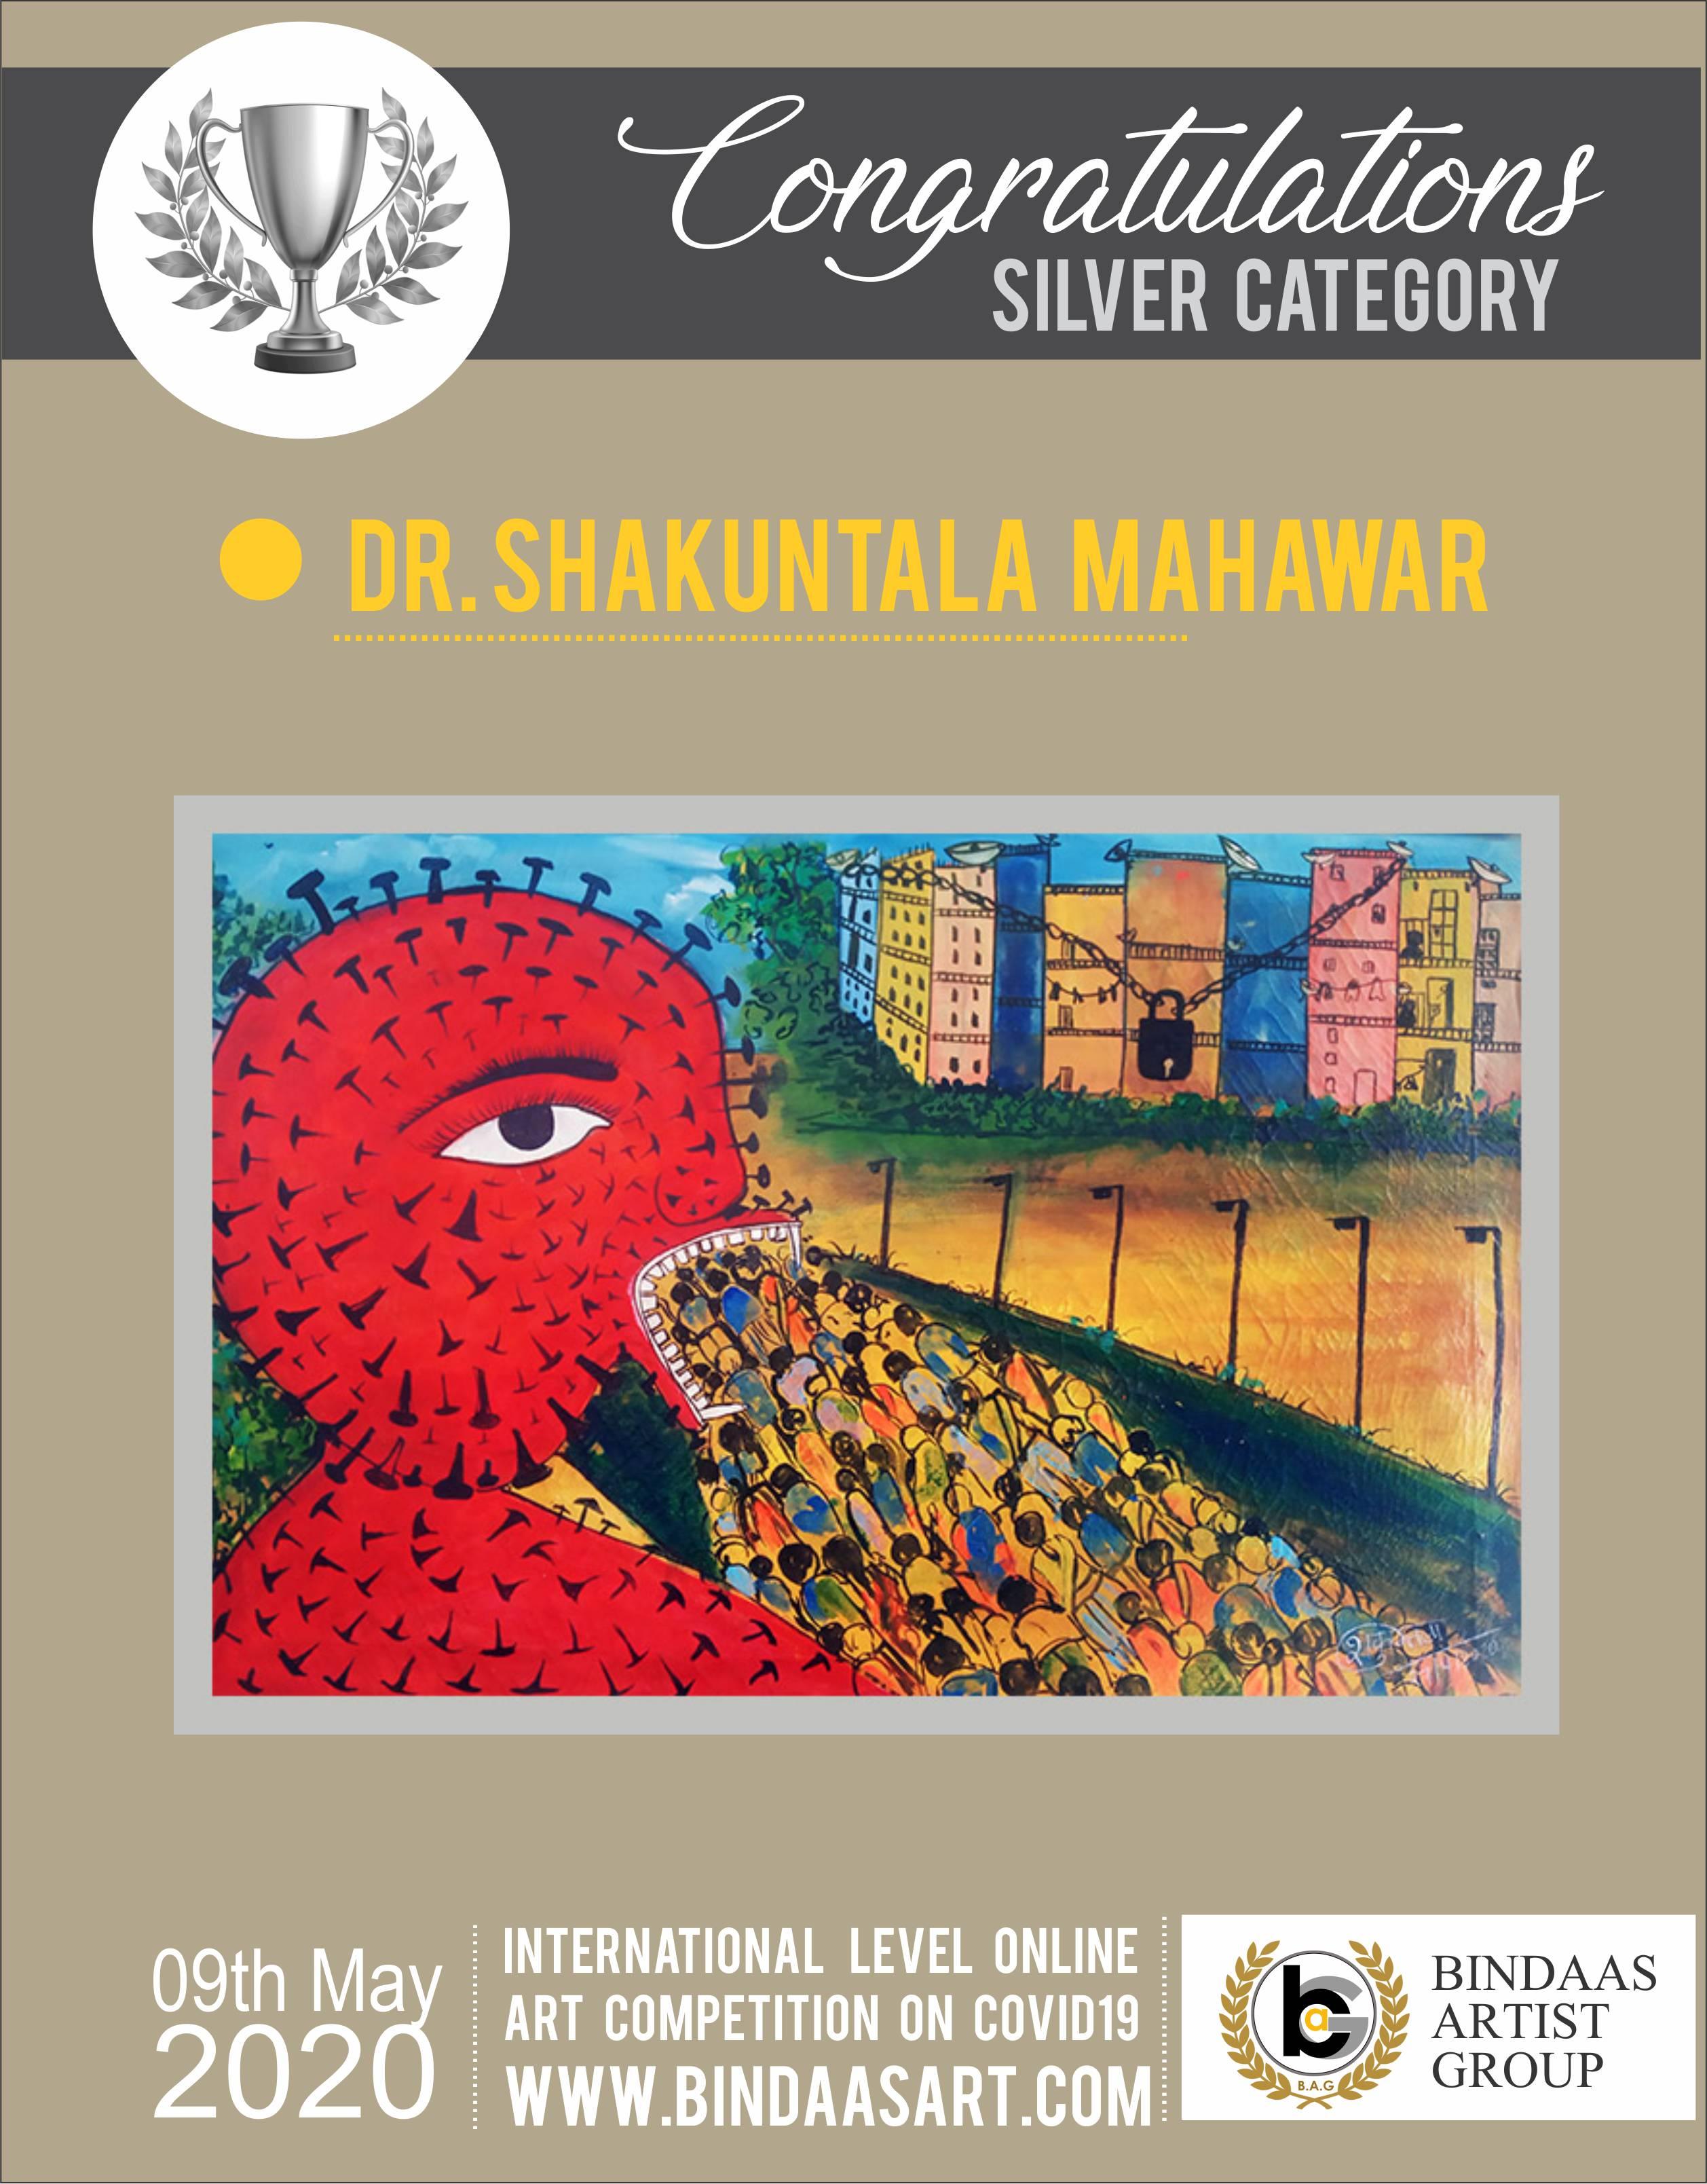 Dr Shakuntala Mahawar